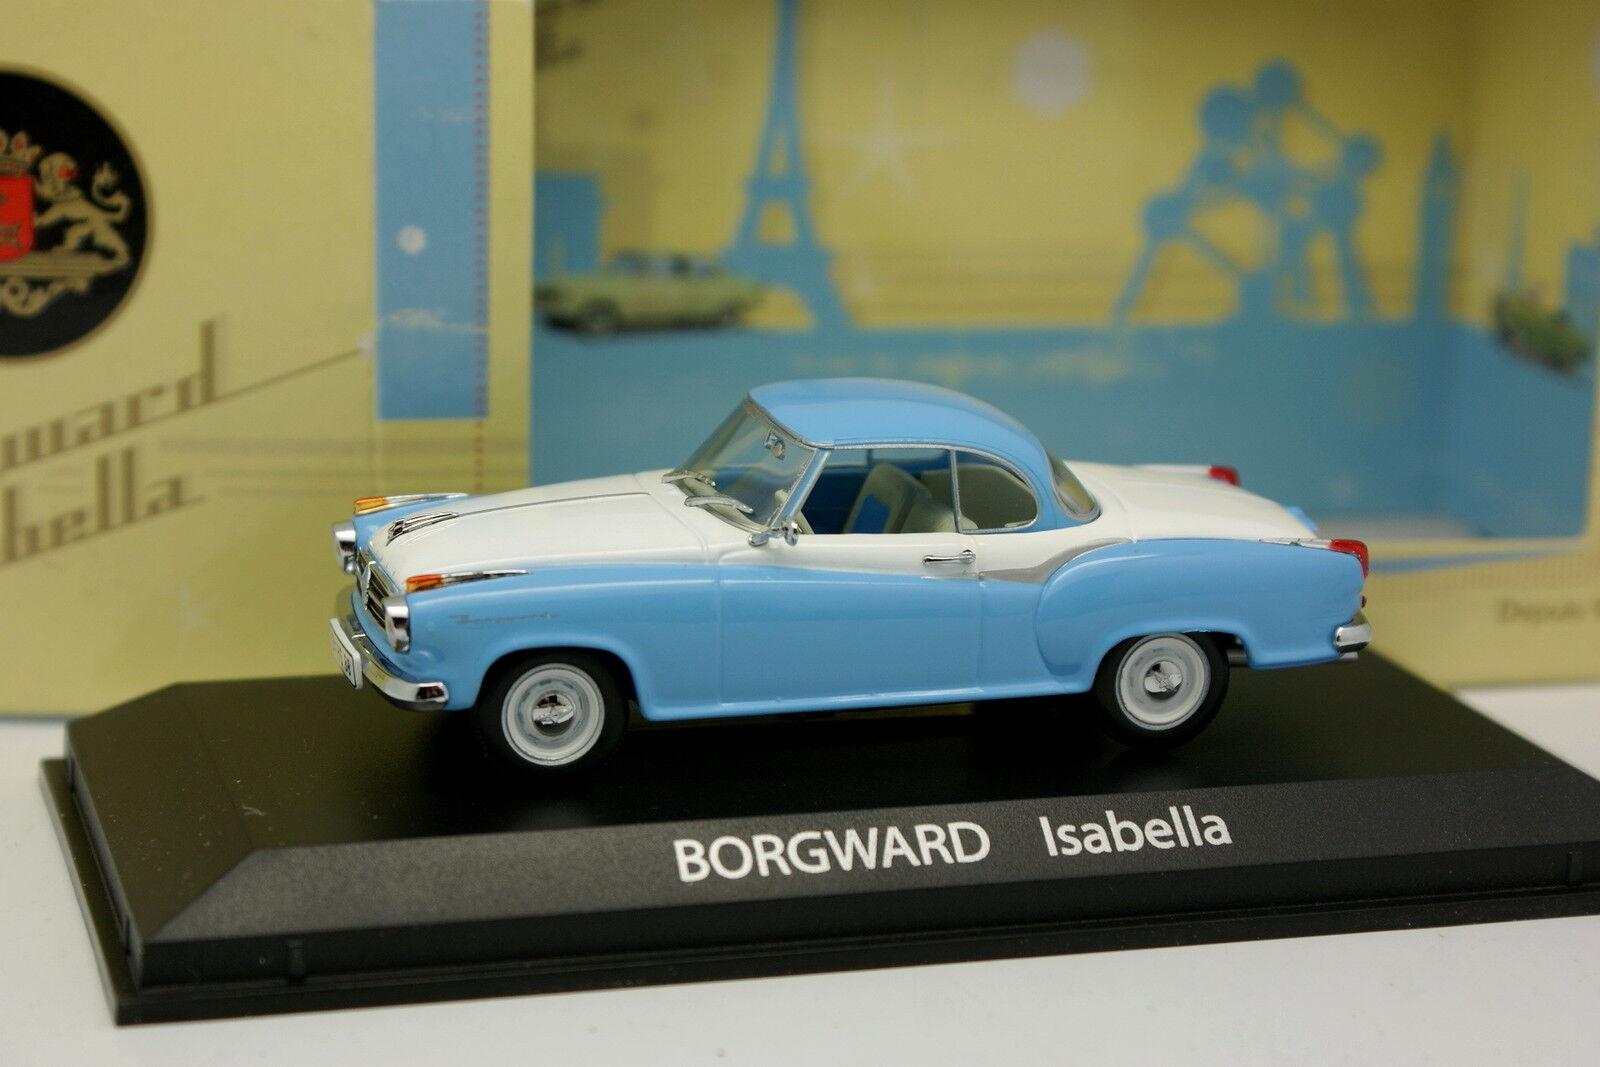 Norev 1 43 - Borgward Isabella Blanche et Bleue